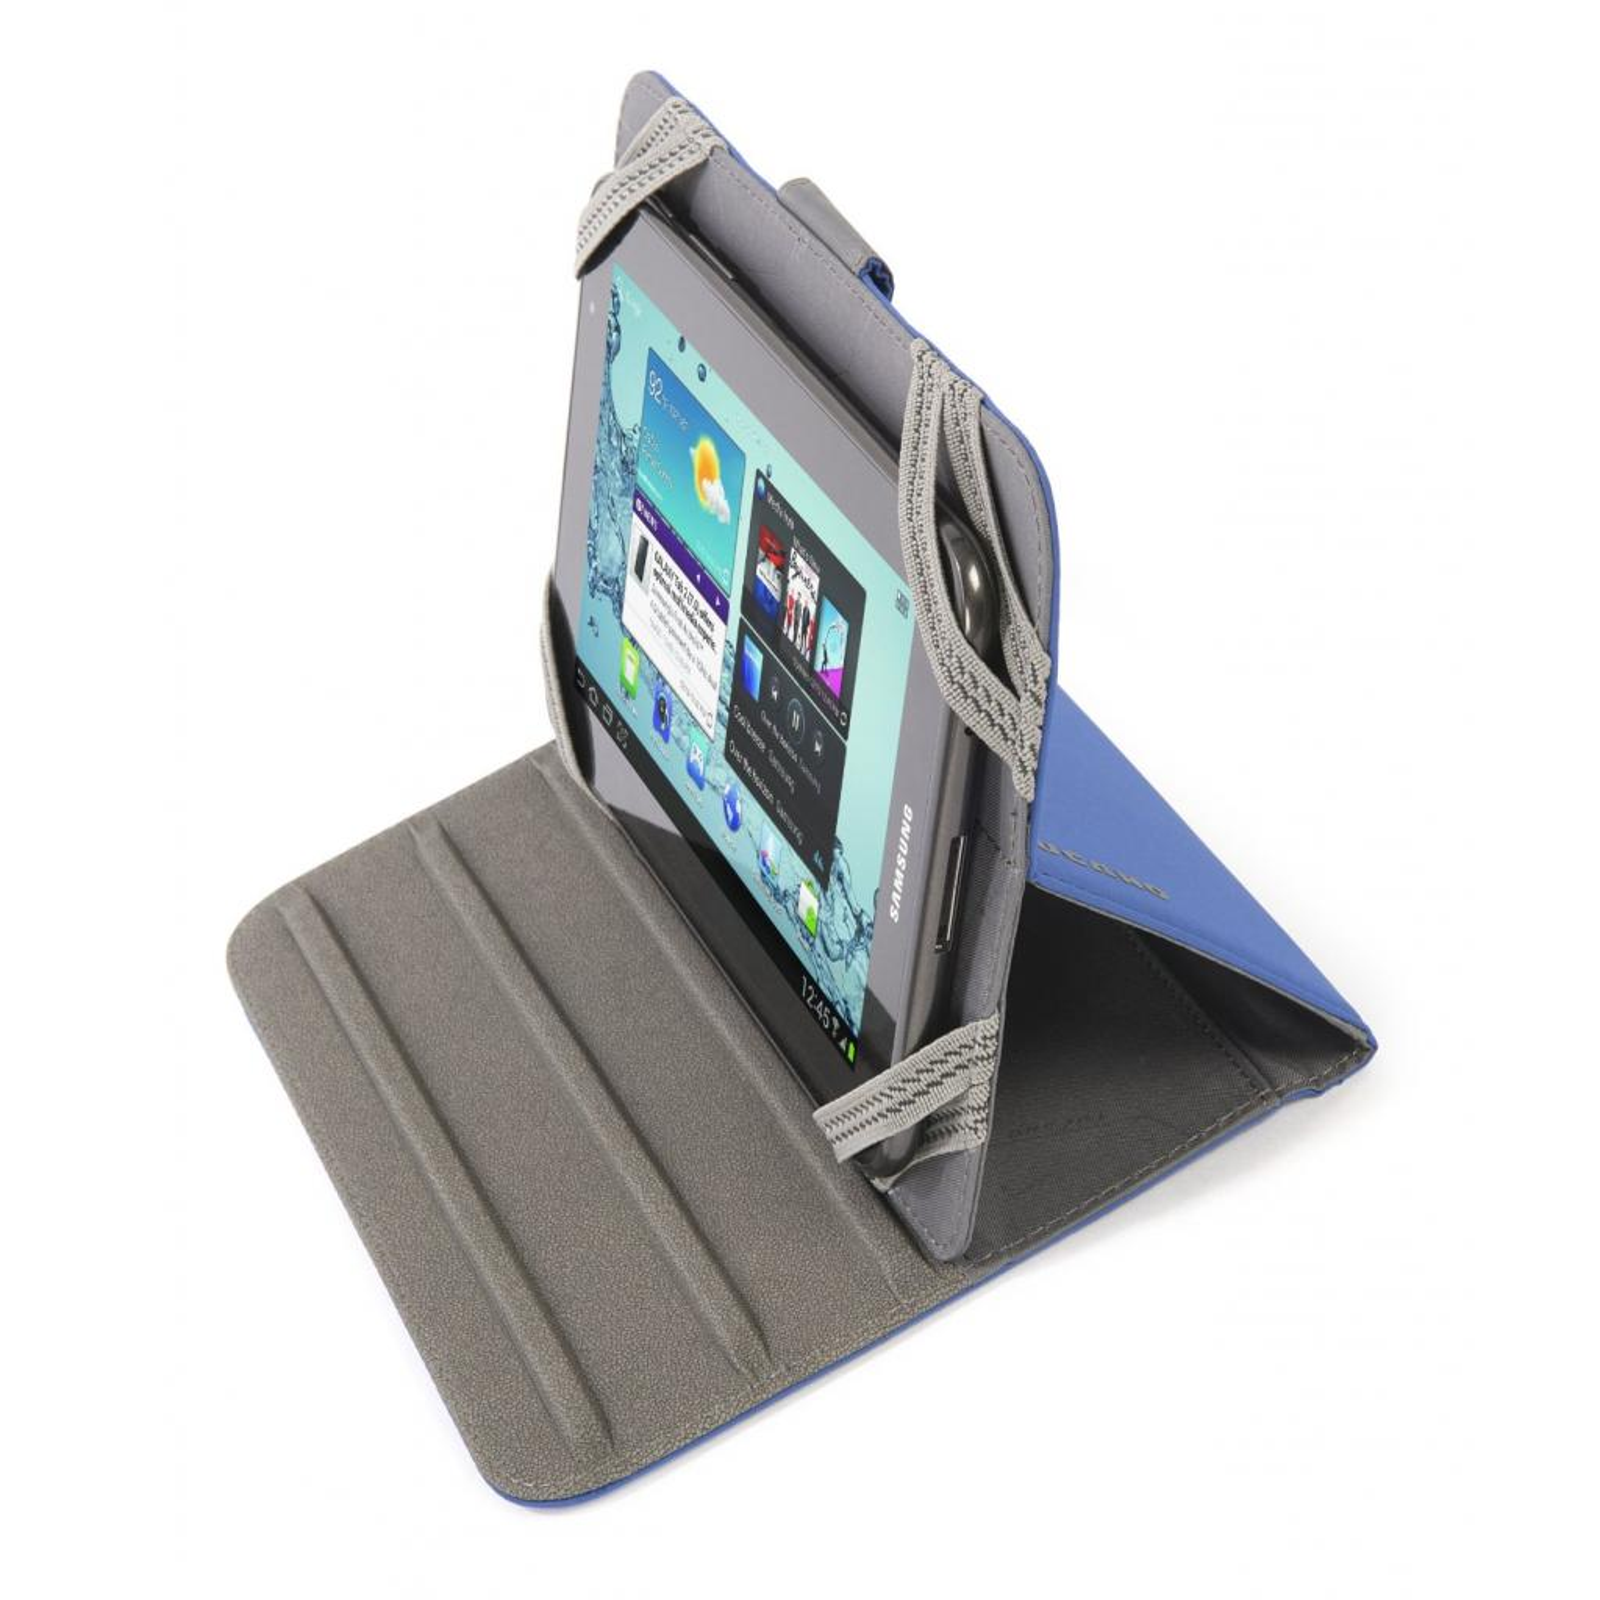 "Чехол для планшета Tucano 7"" Facile Stand Blue (TAB-FA7-B) изображение 7"